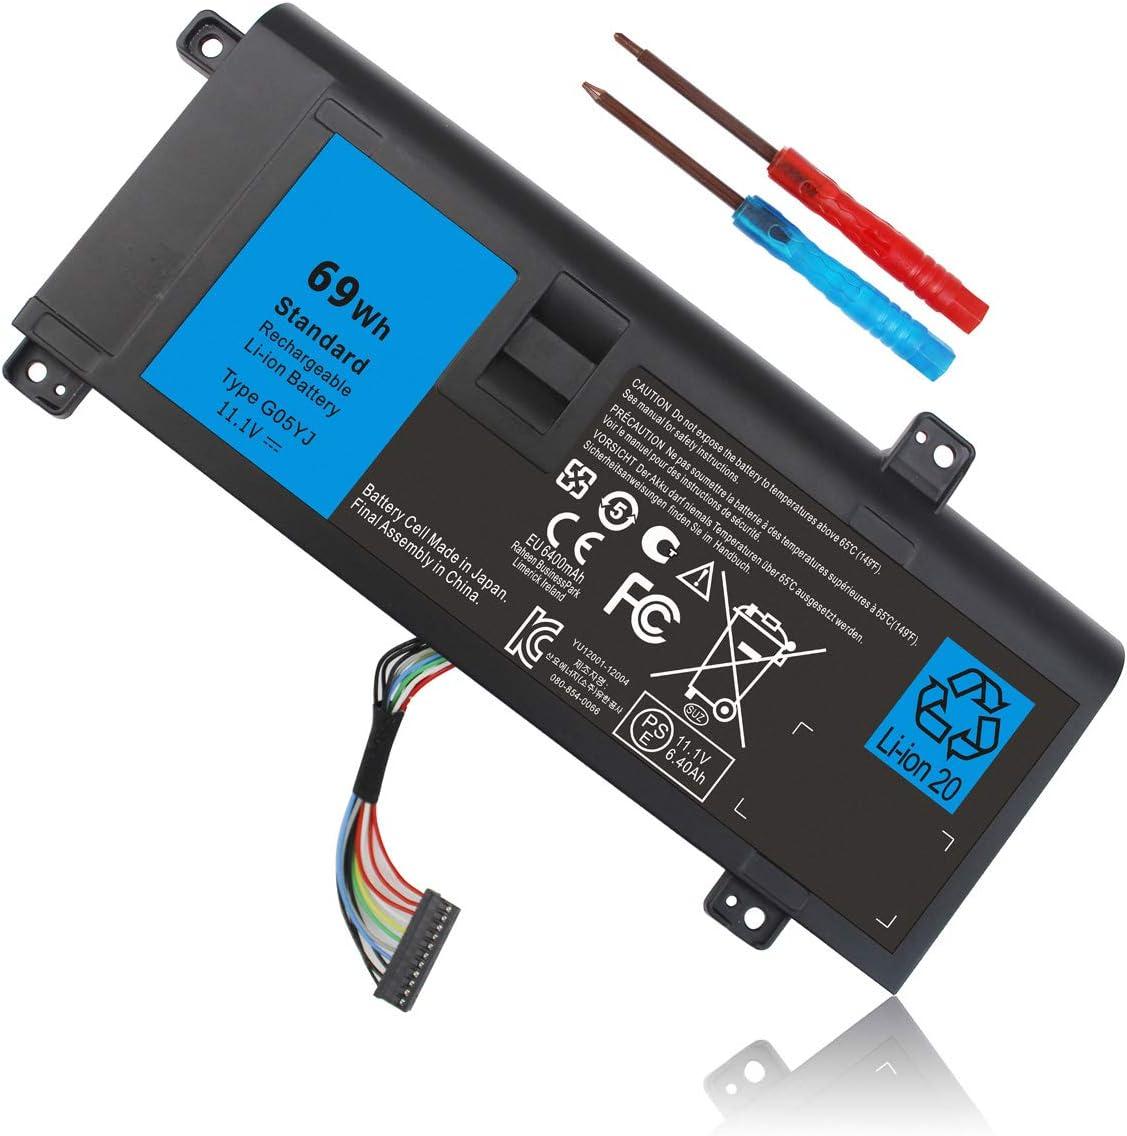 11.1V 69Wh G05YJ Y3PN0 8X70T 0G05YJ Laptop Battery Compatible with Dell Alienware 14 A14 M14X R3 R4 P39G 14D-1528 ALW14D-1728 ALW14D-4728 ALW14D-4828 ALW14D-5528 ALW14D-5828 ALW14D-5728 ALW14D-2728